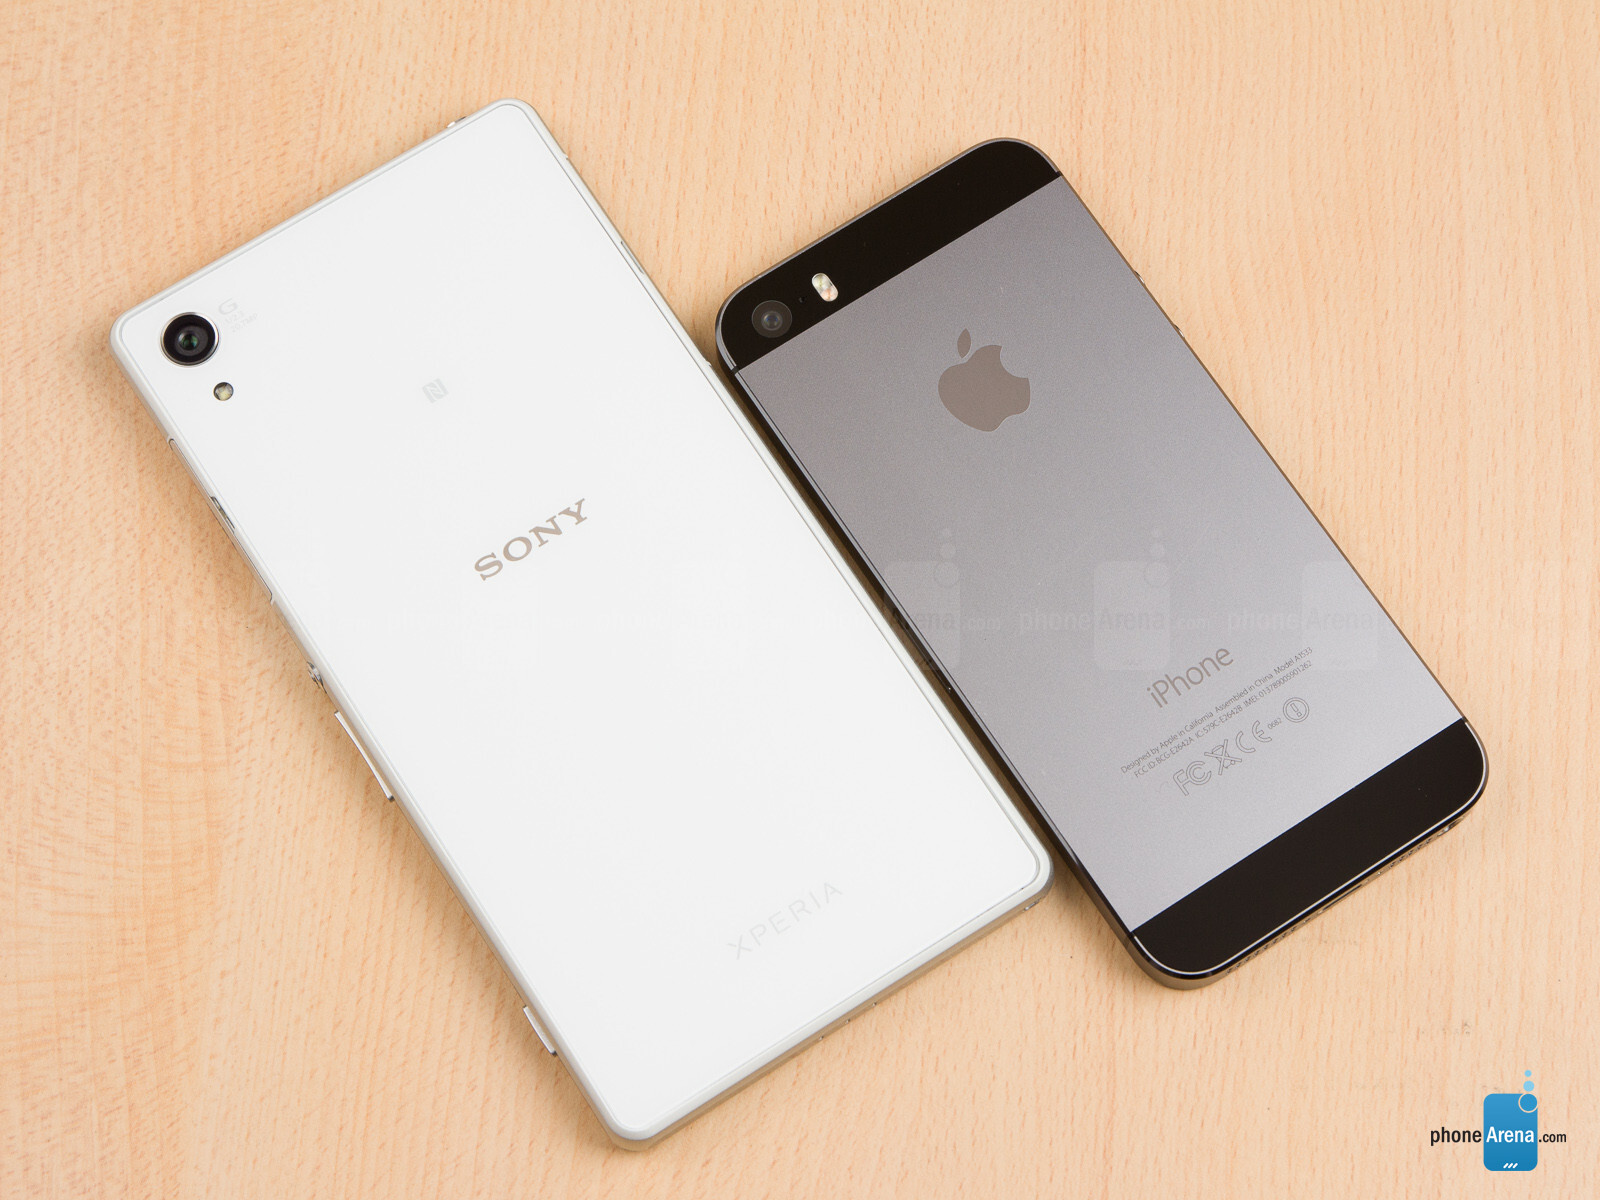 Sony Xperia Z2 vs Apple iPhone 5s 02